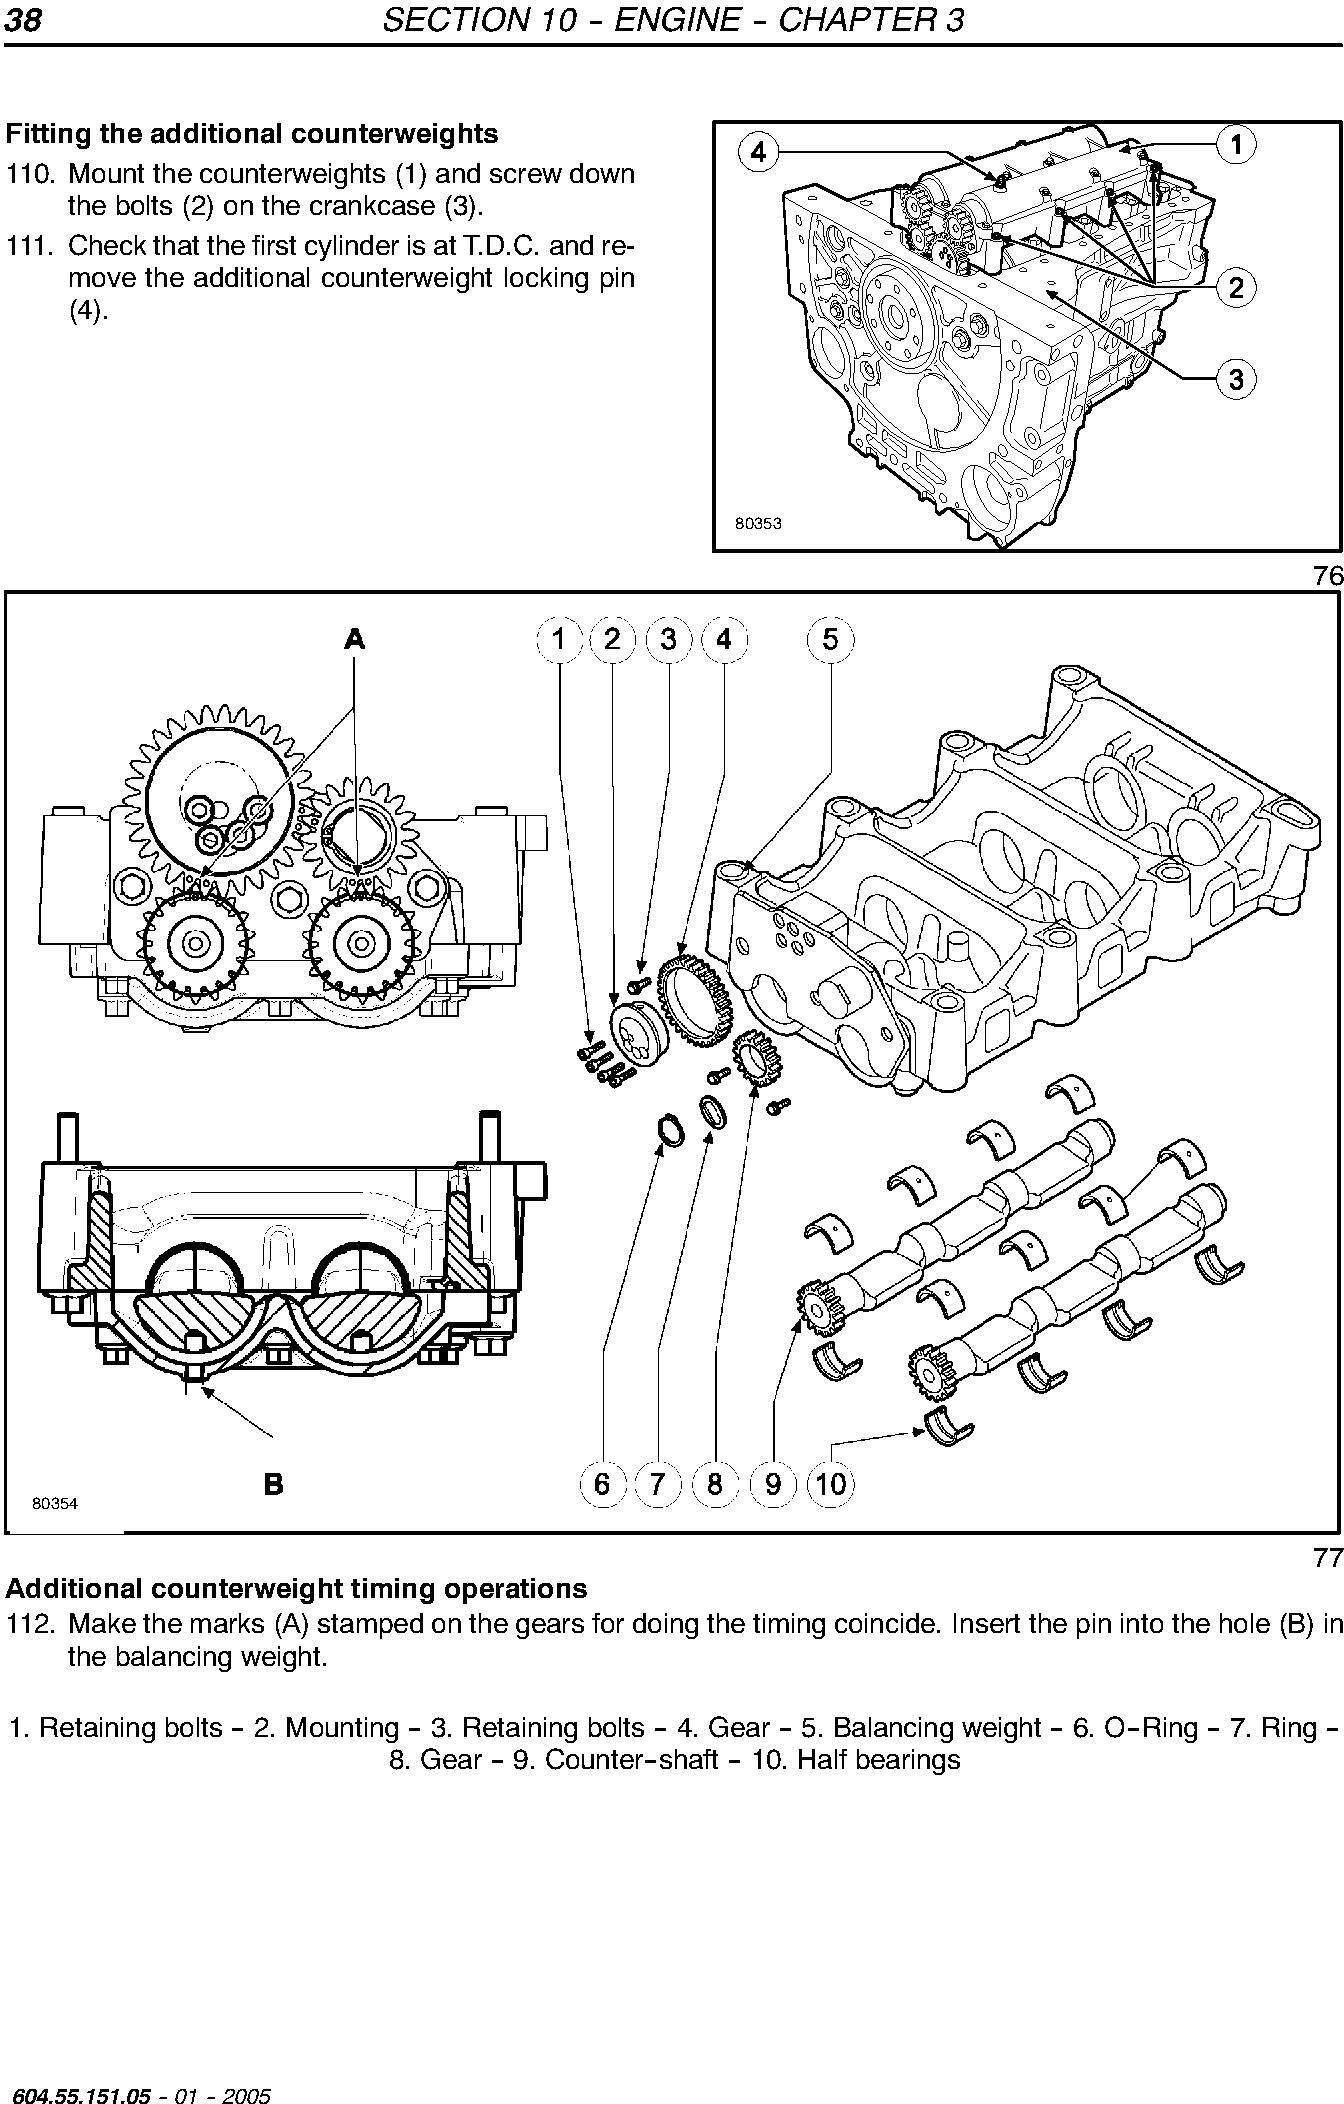 New Holland TS100A, TS110A, TS115A, TS125A, TS130A, TS135A Service Manual - 2